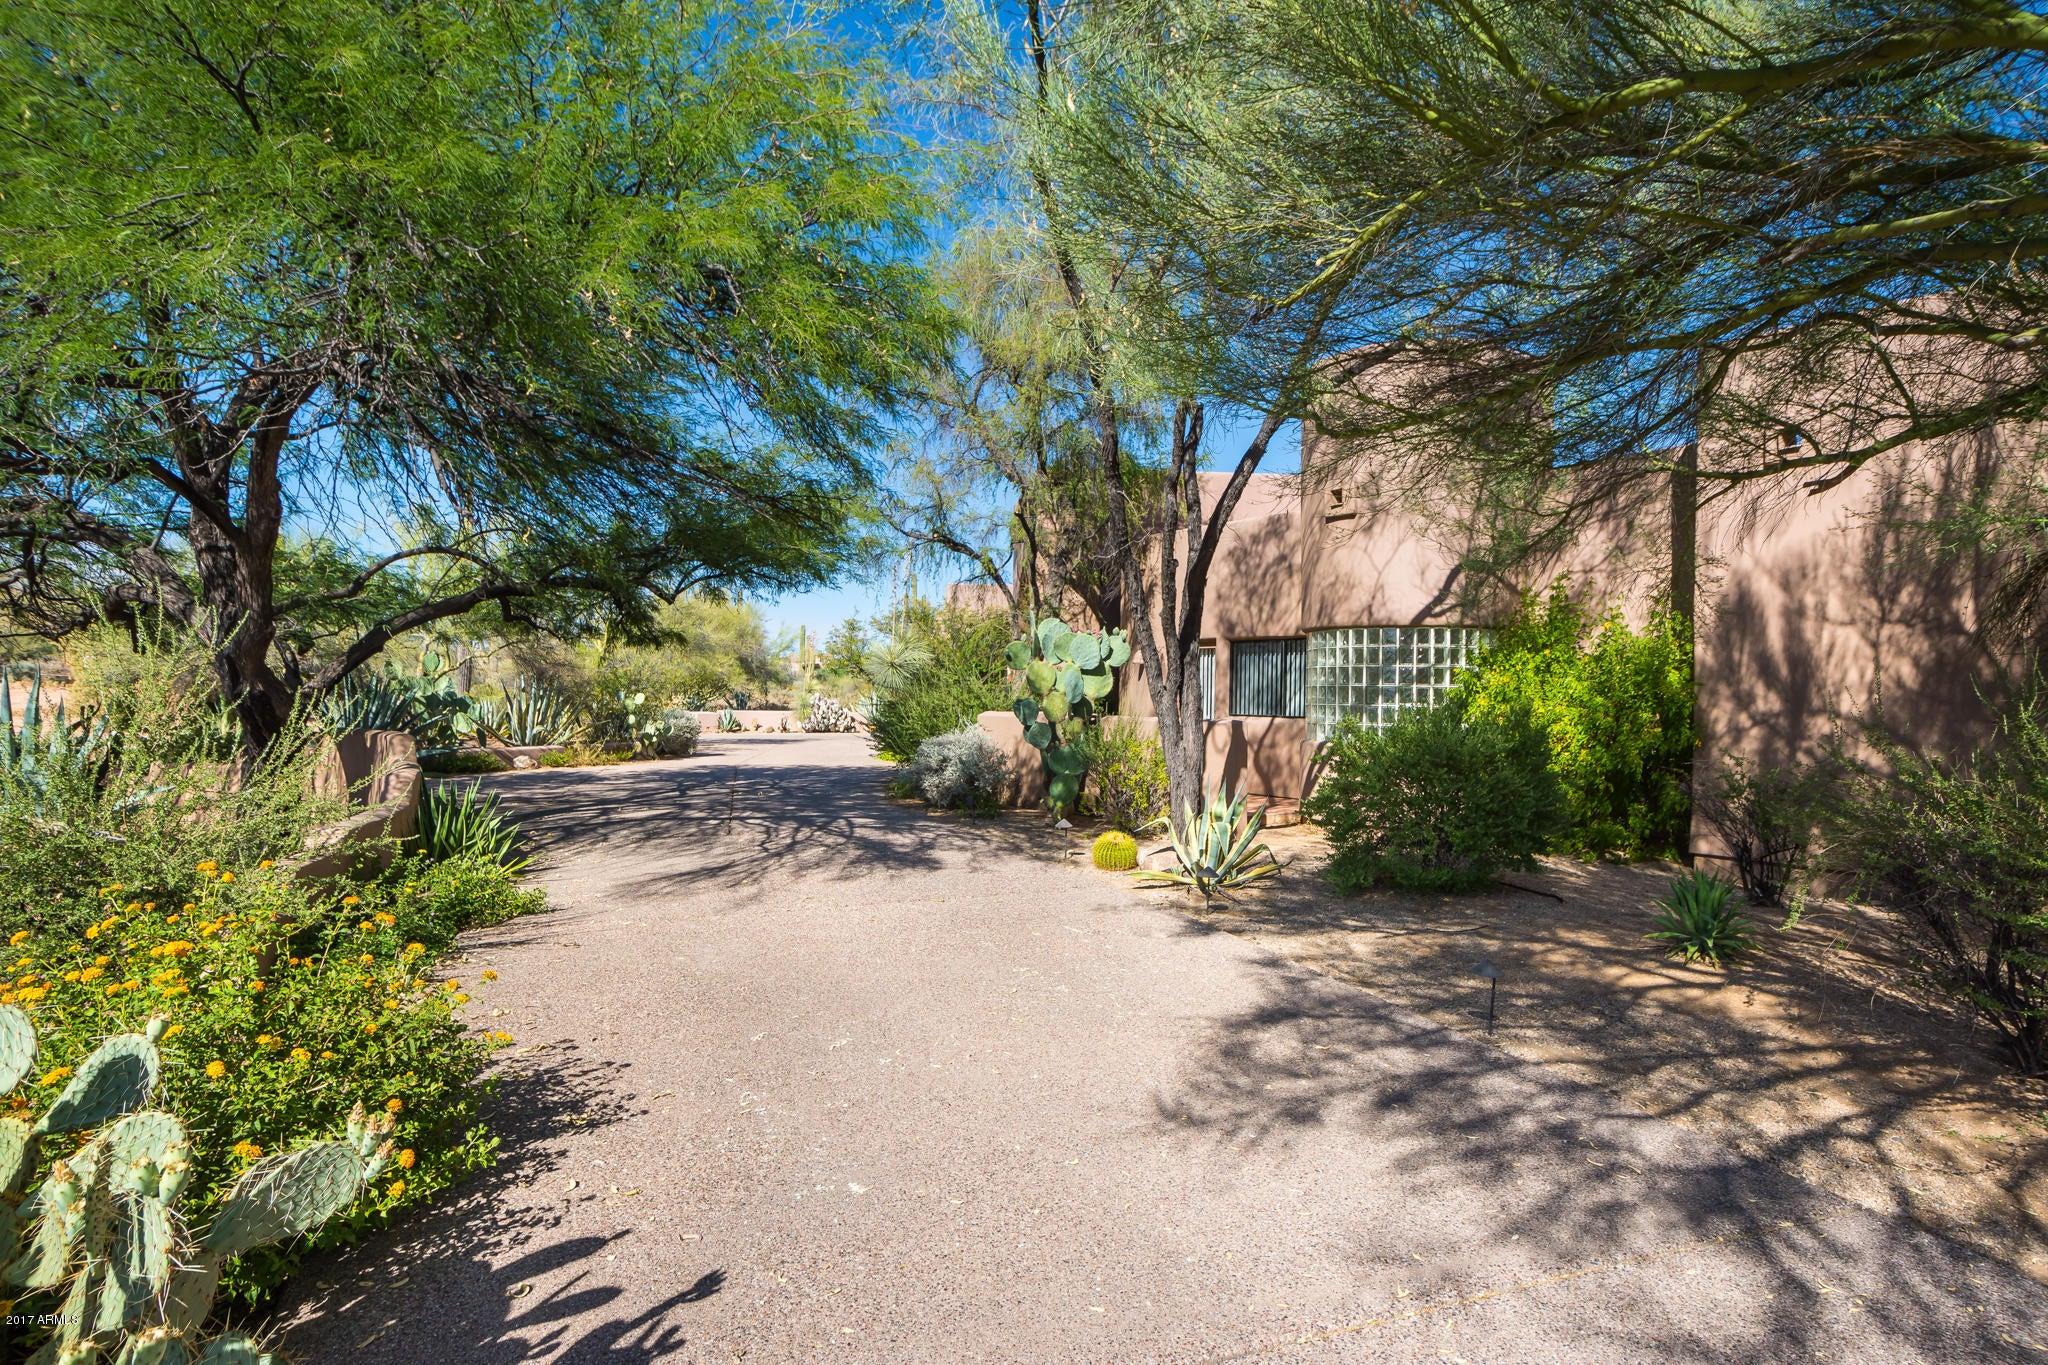 MLS 5626839 30600 N PIMA Road Unit 52, Scottsdale, AZ 85266 Scottsdale AZ Sincuidados